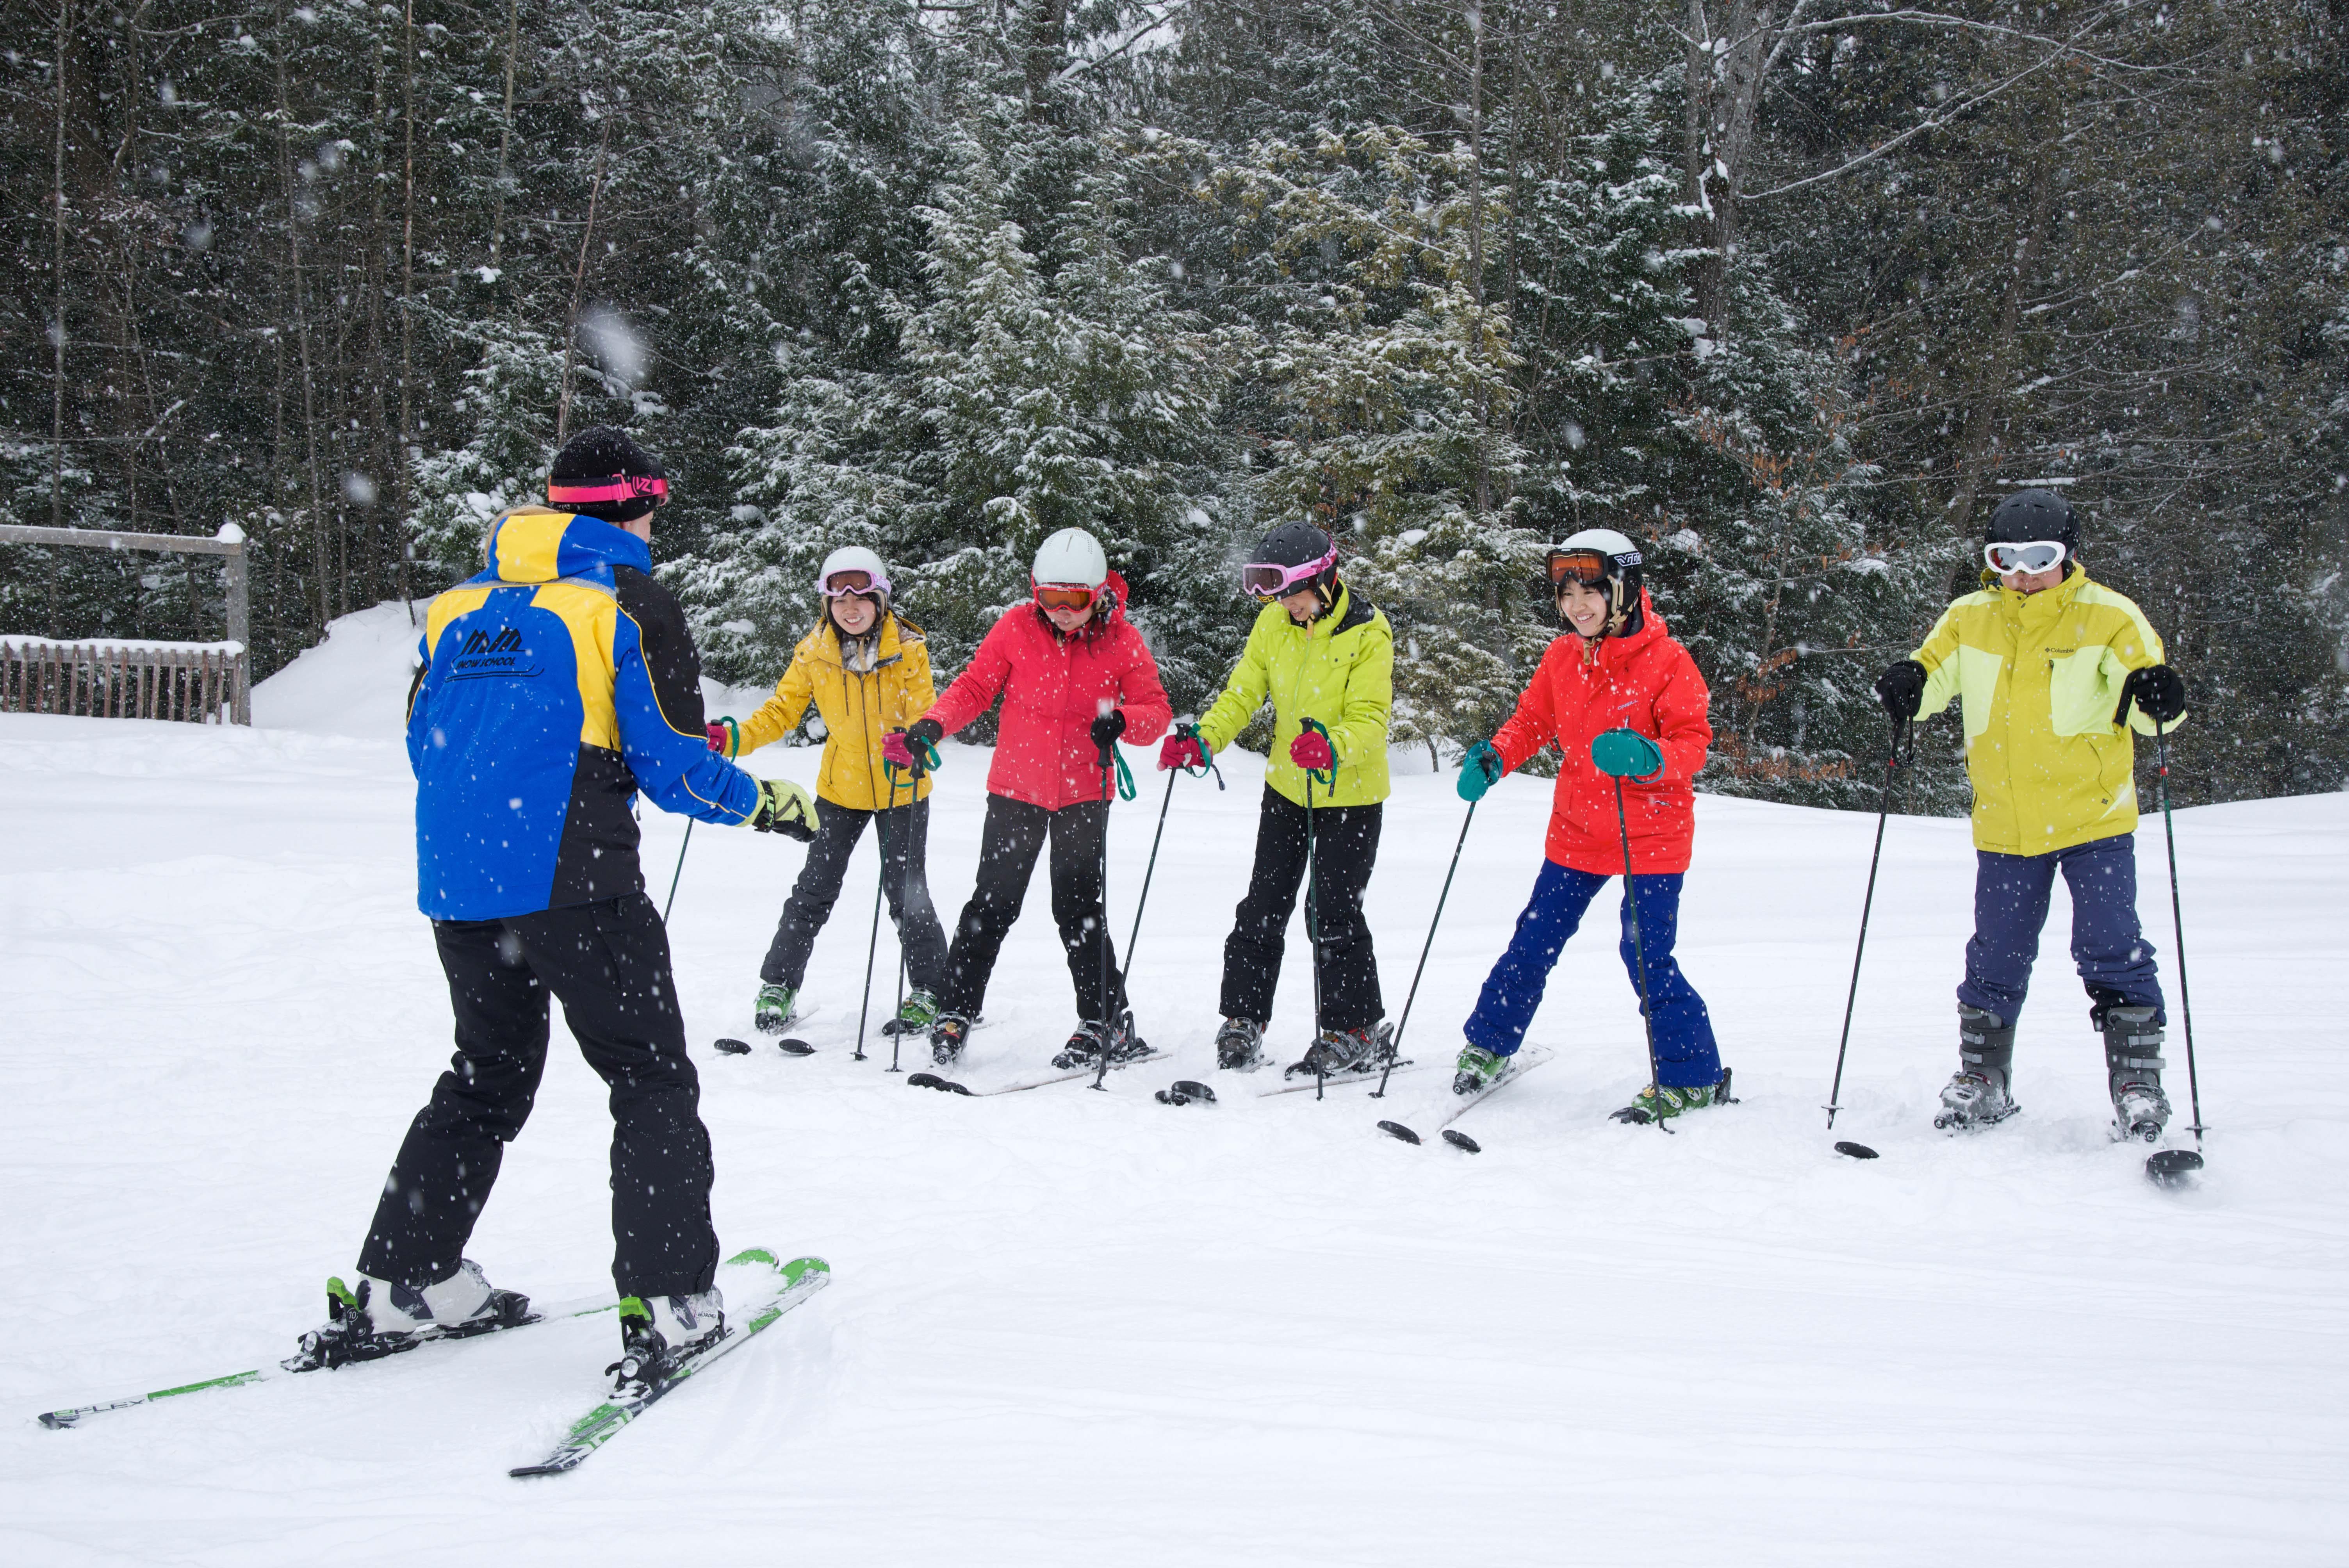 Ski, Tubing and Snowboarding